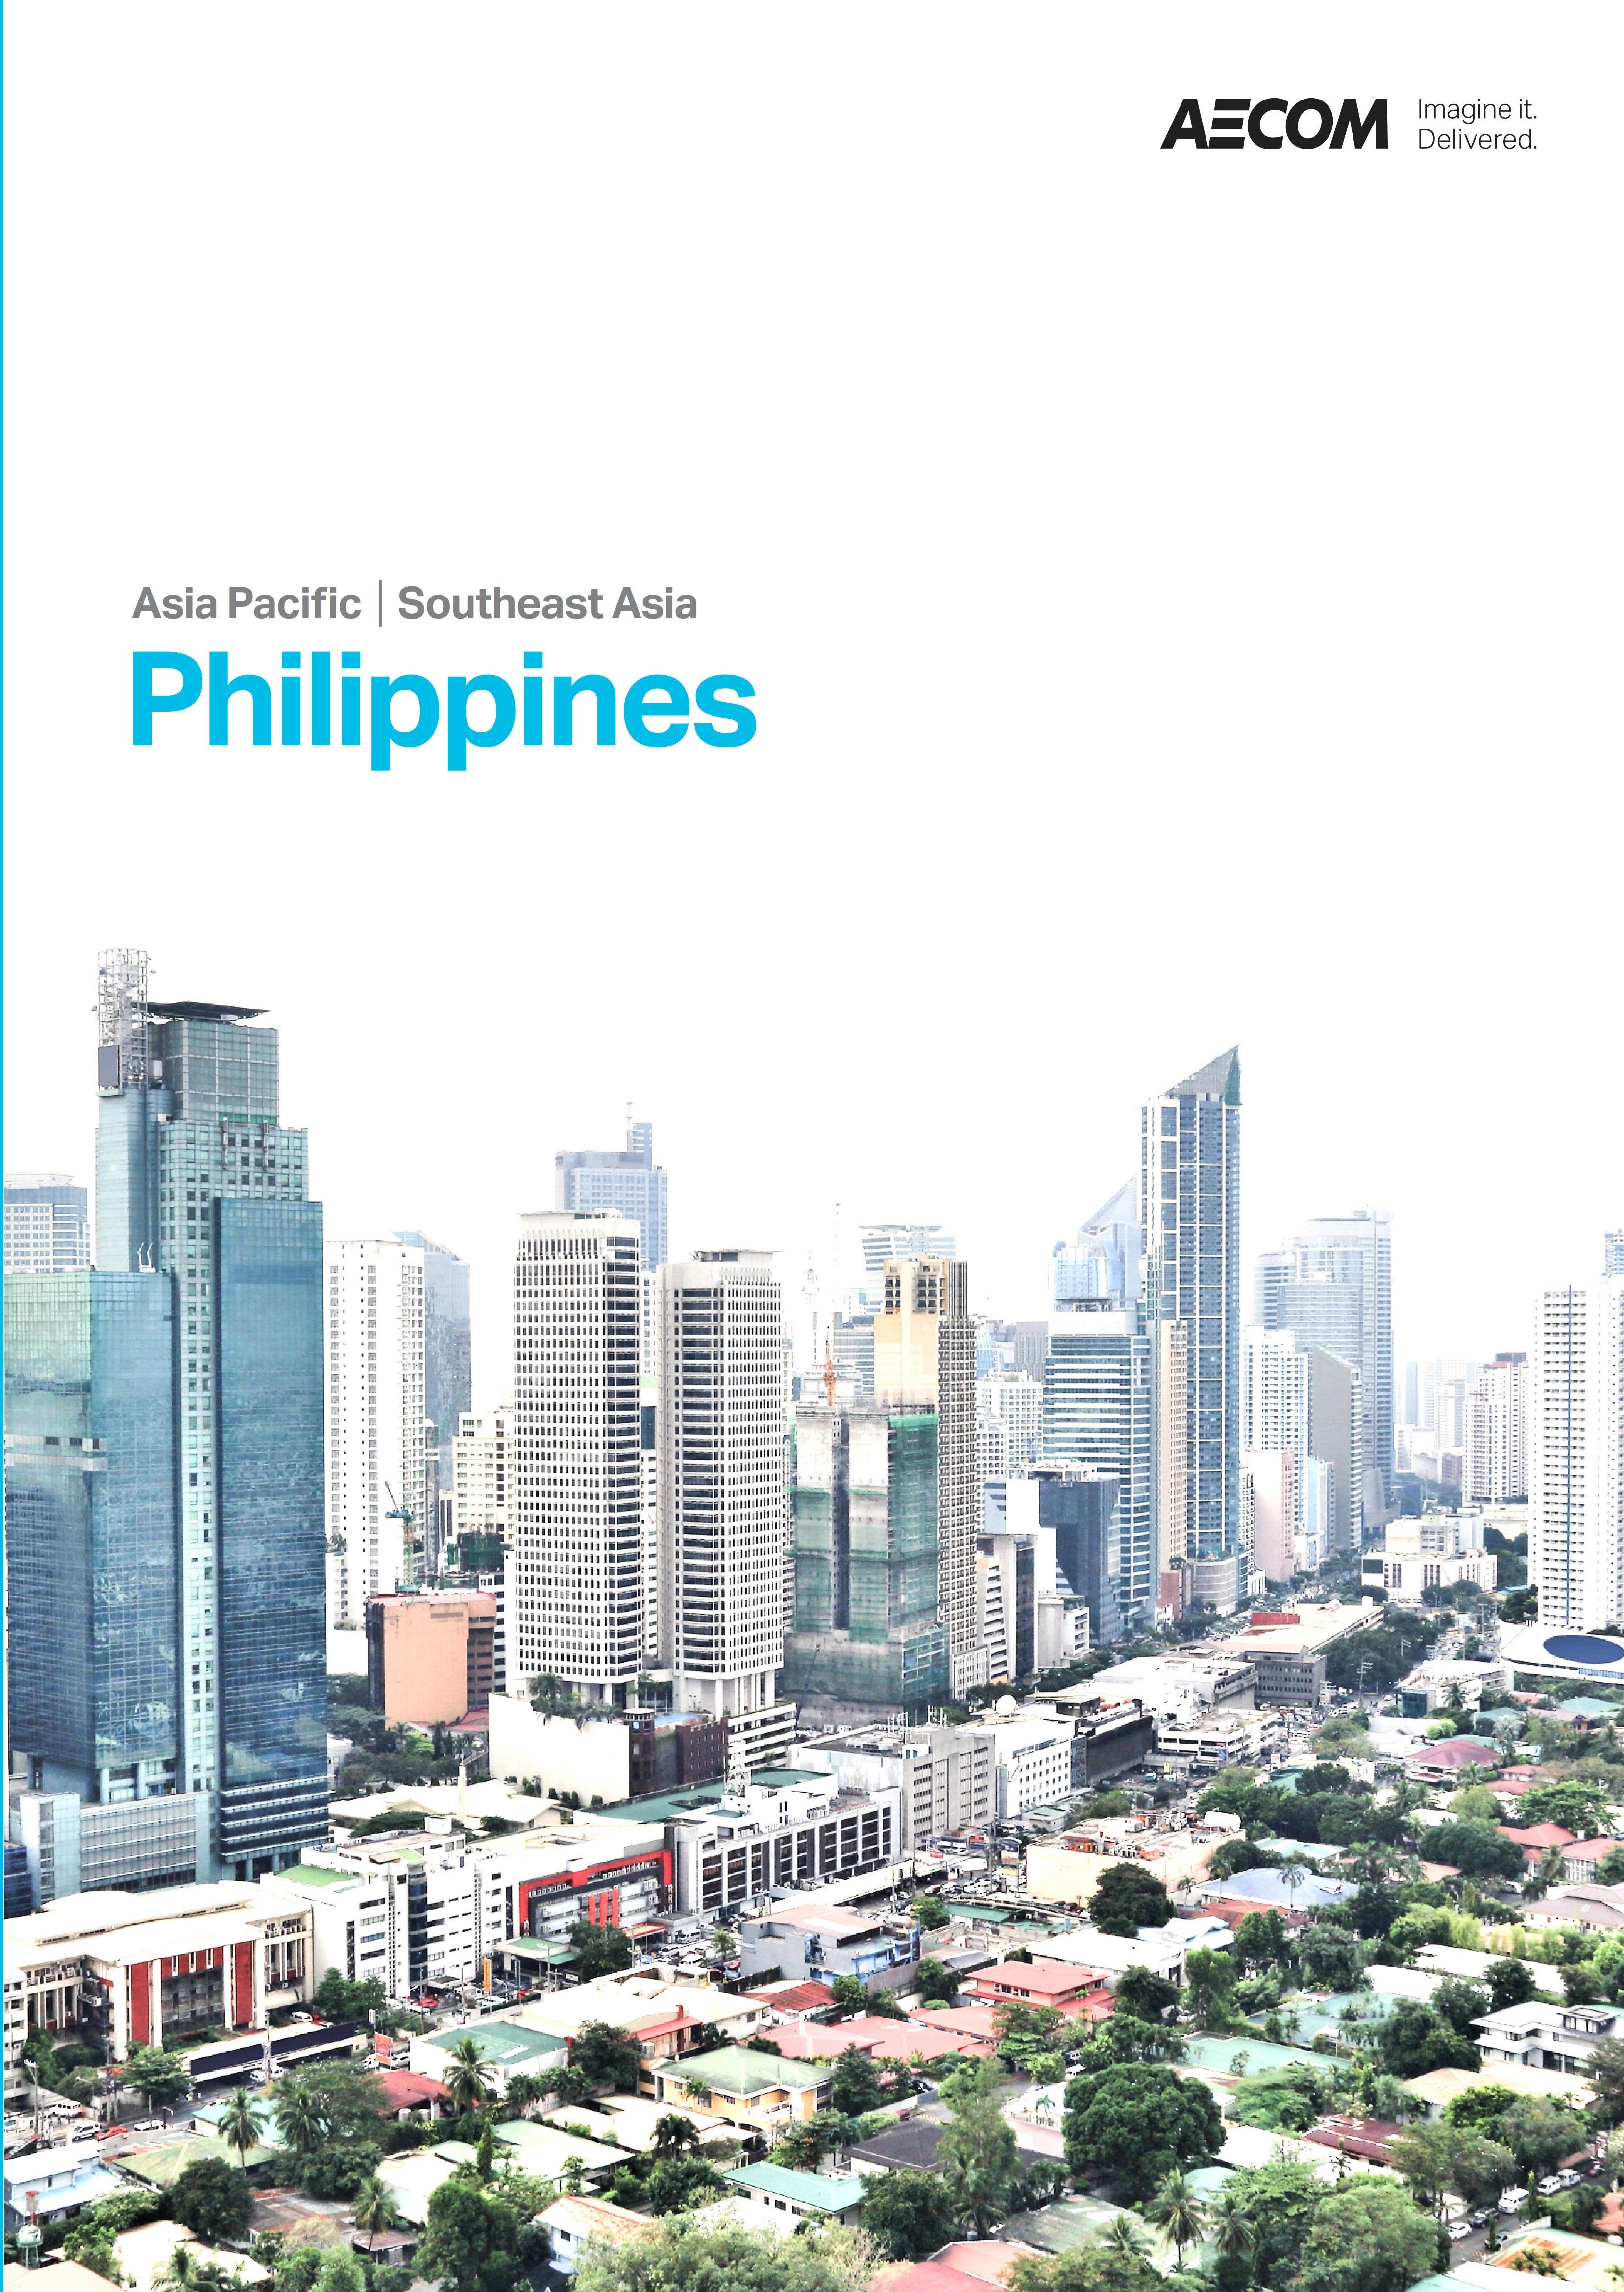 AECOM - Philippines